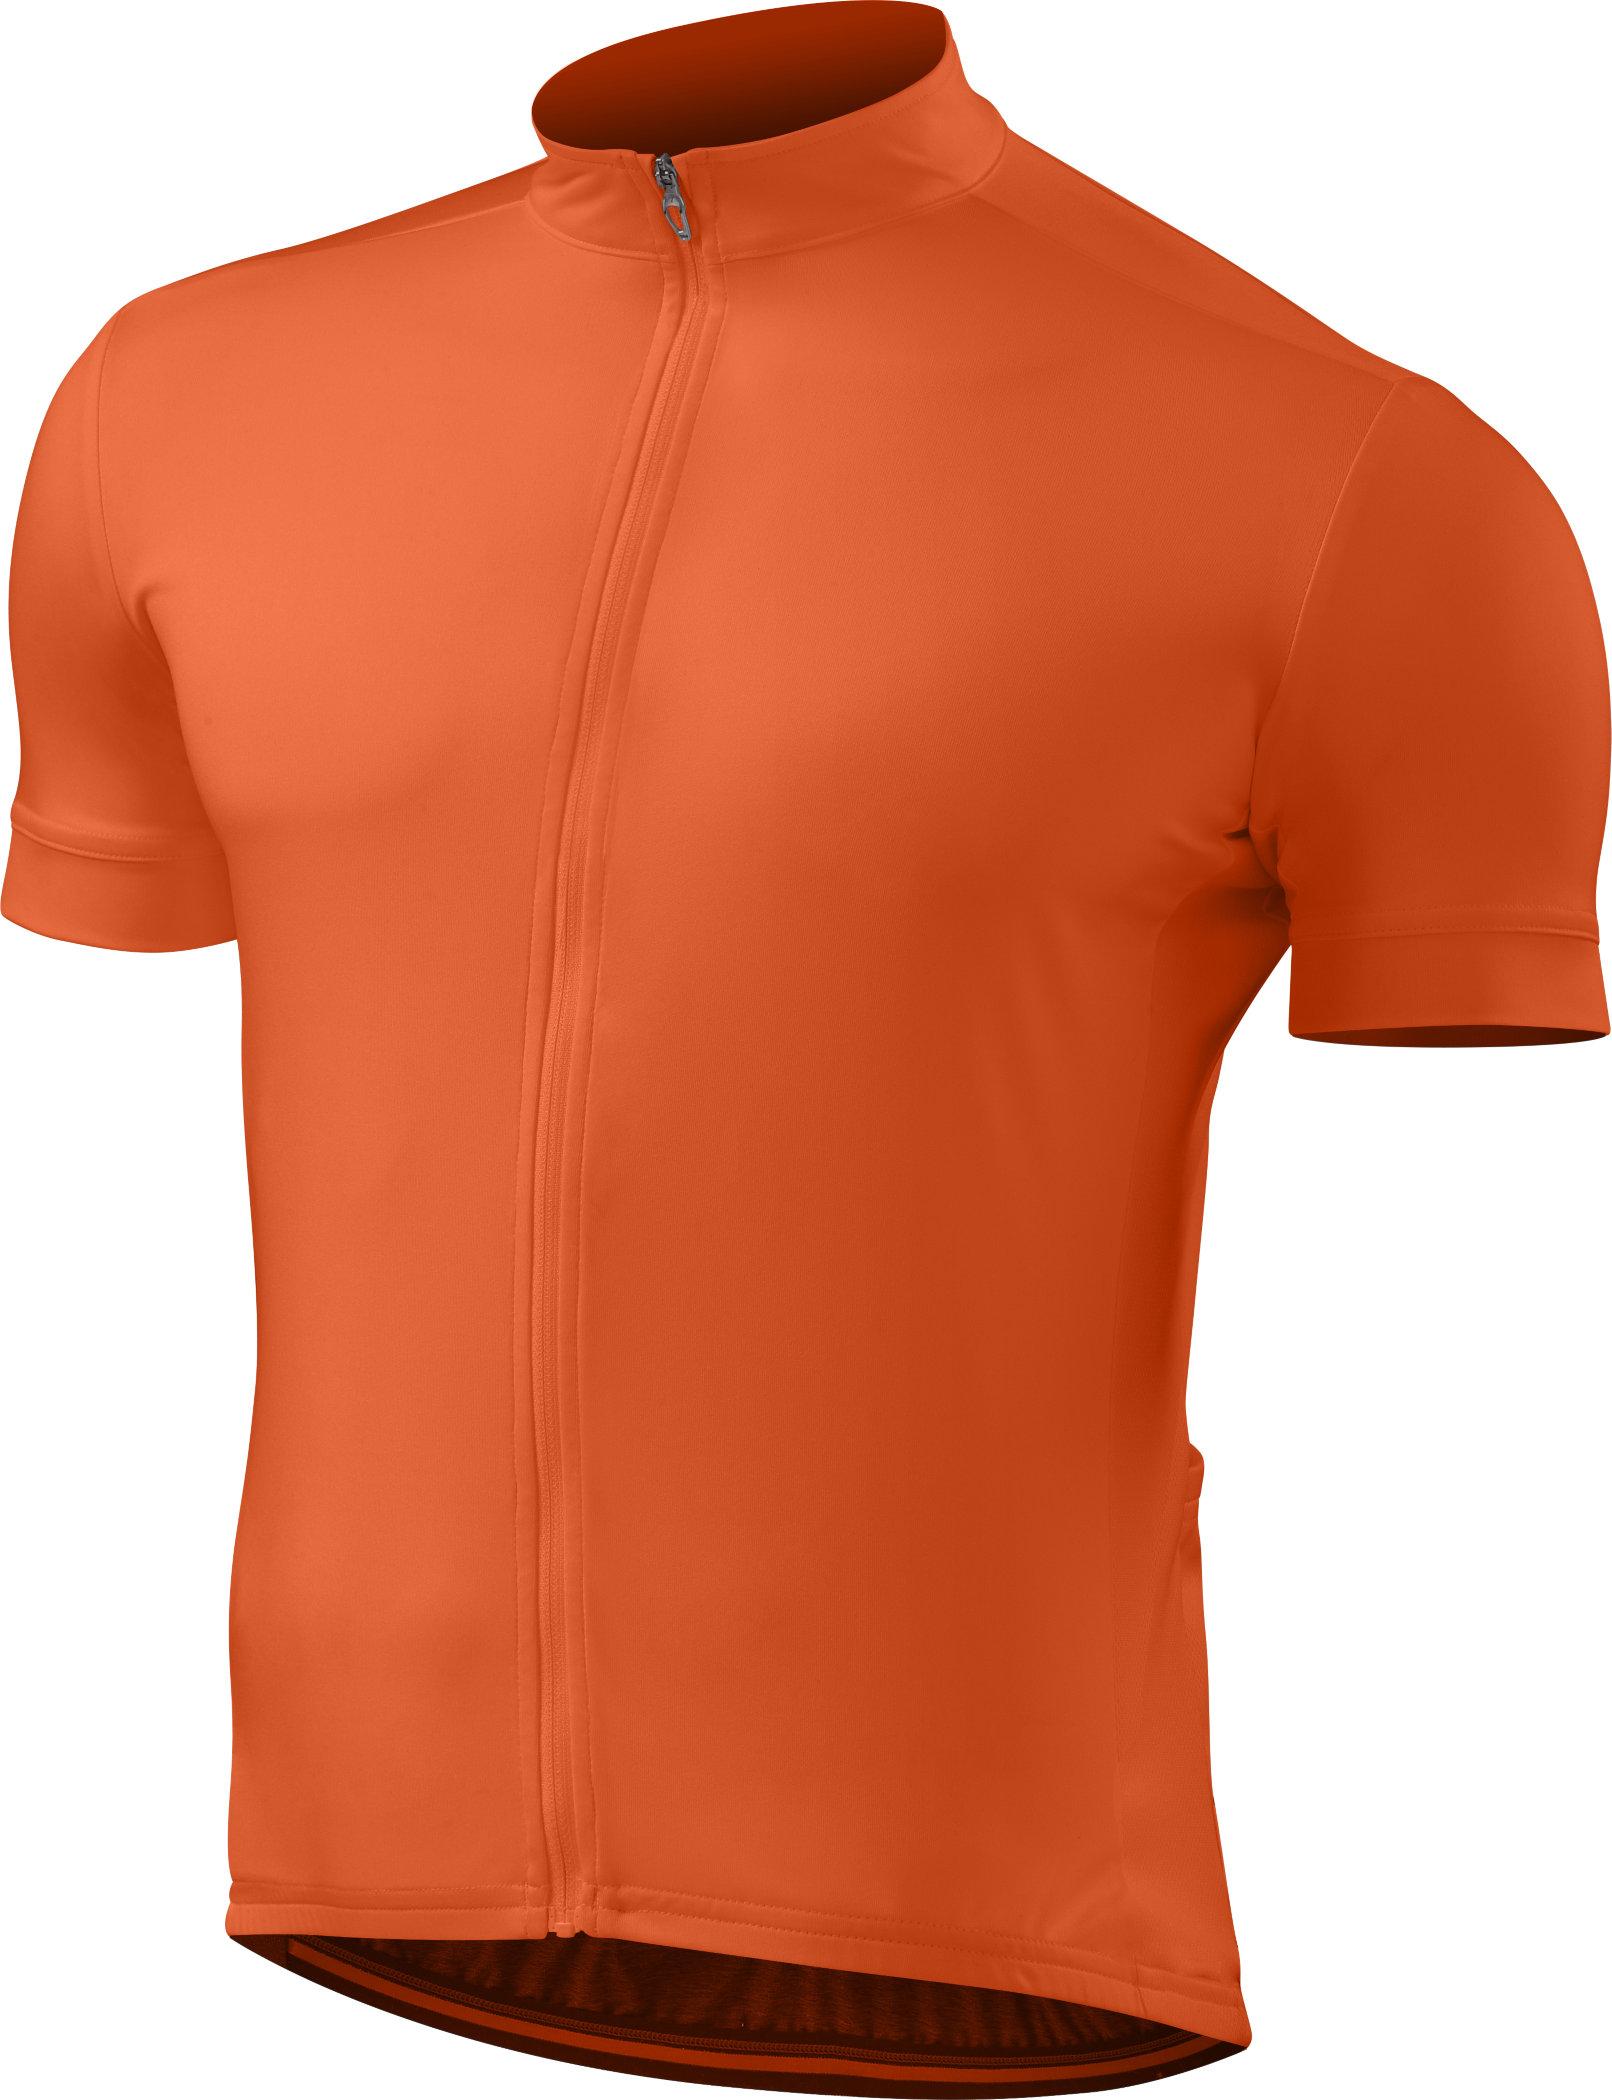 Specialized RBX Sport Jersey Neon Orange Medium - Alpha Bikes